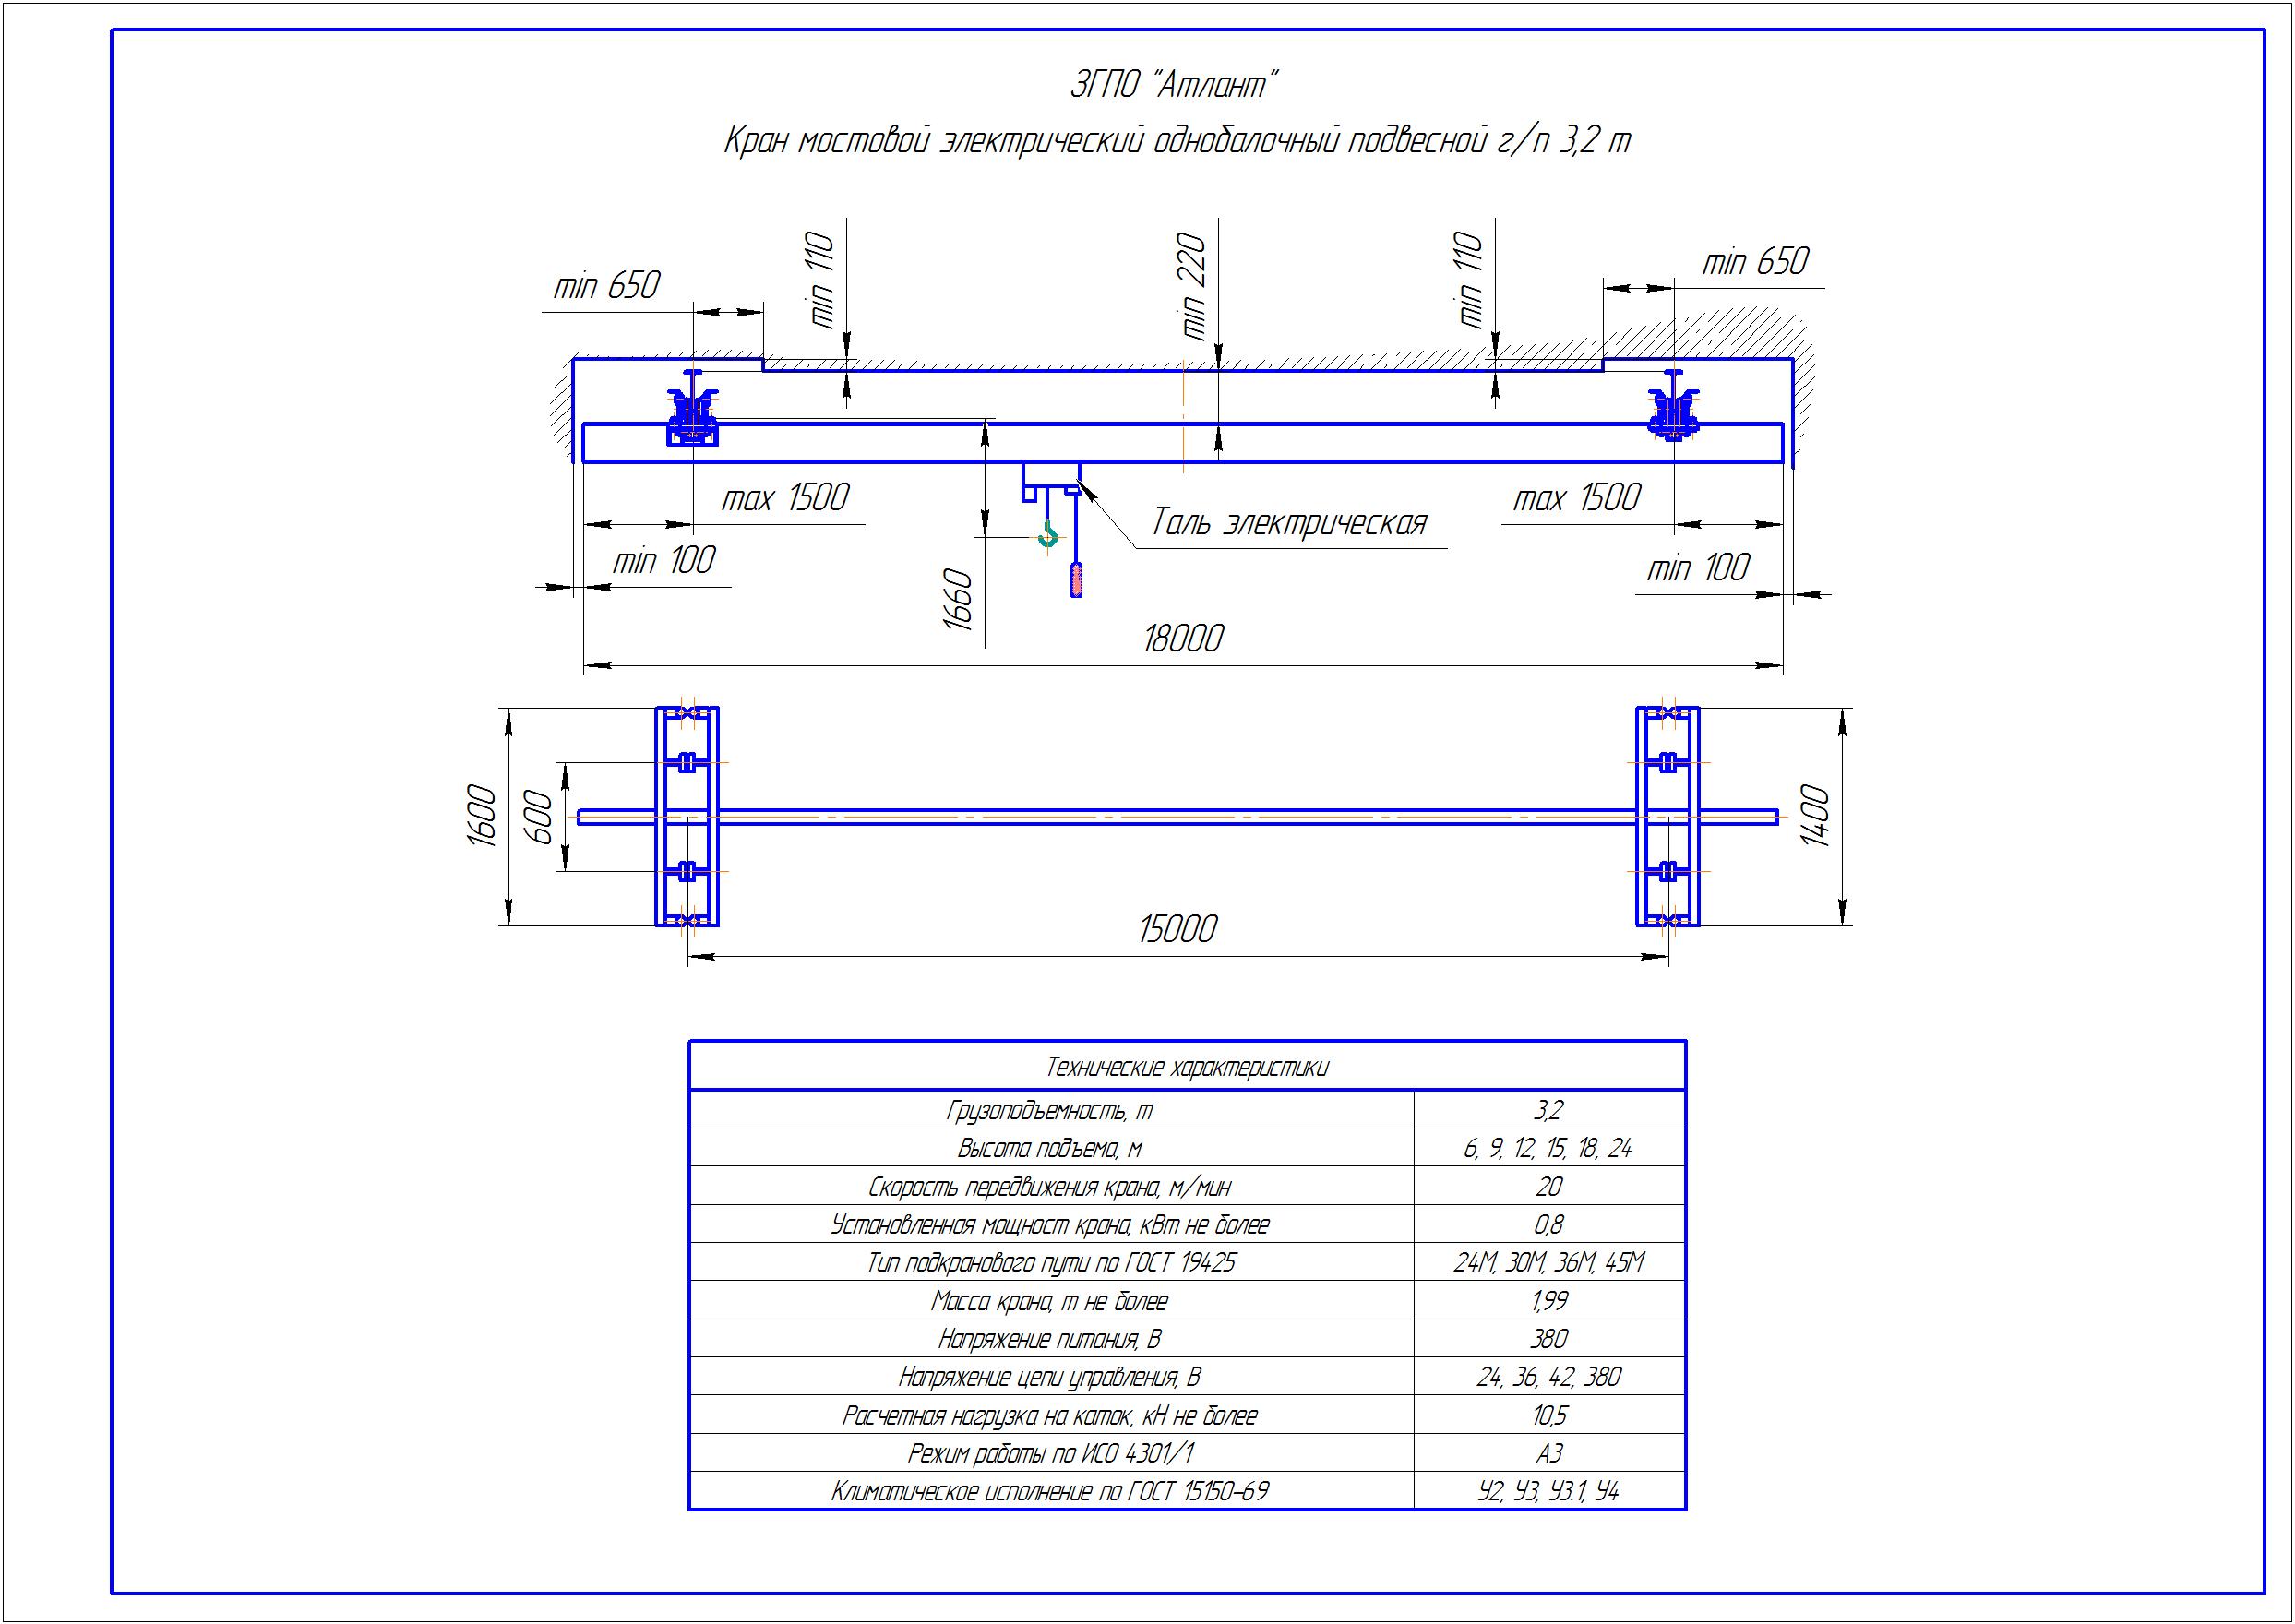 KBP 3 5 - Подвесная кран балка